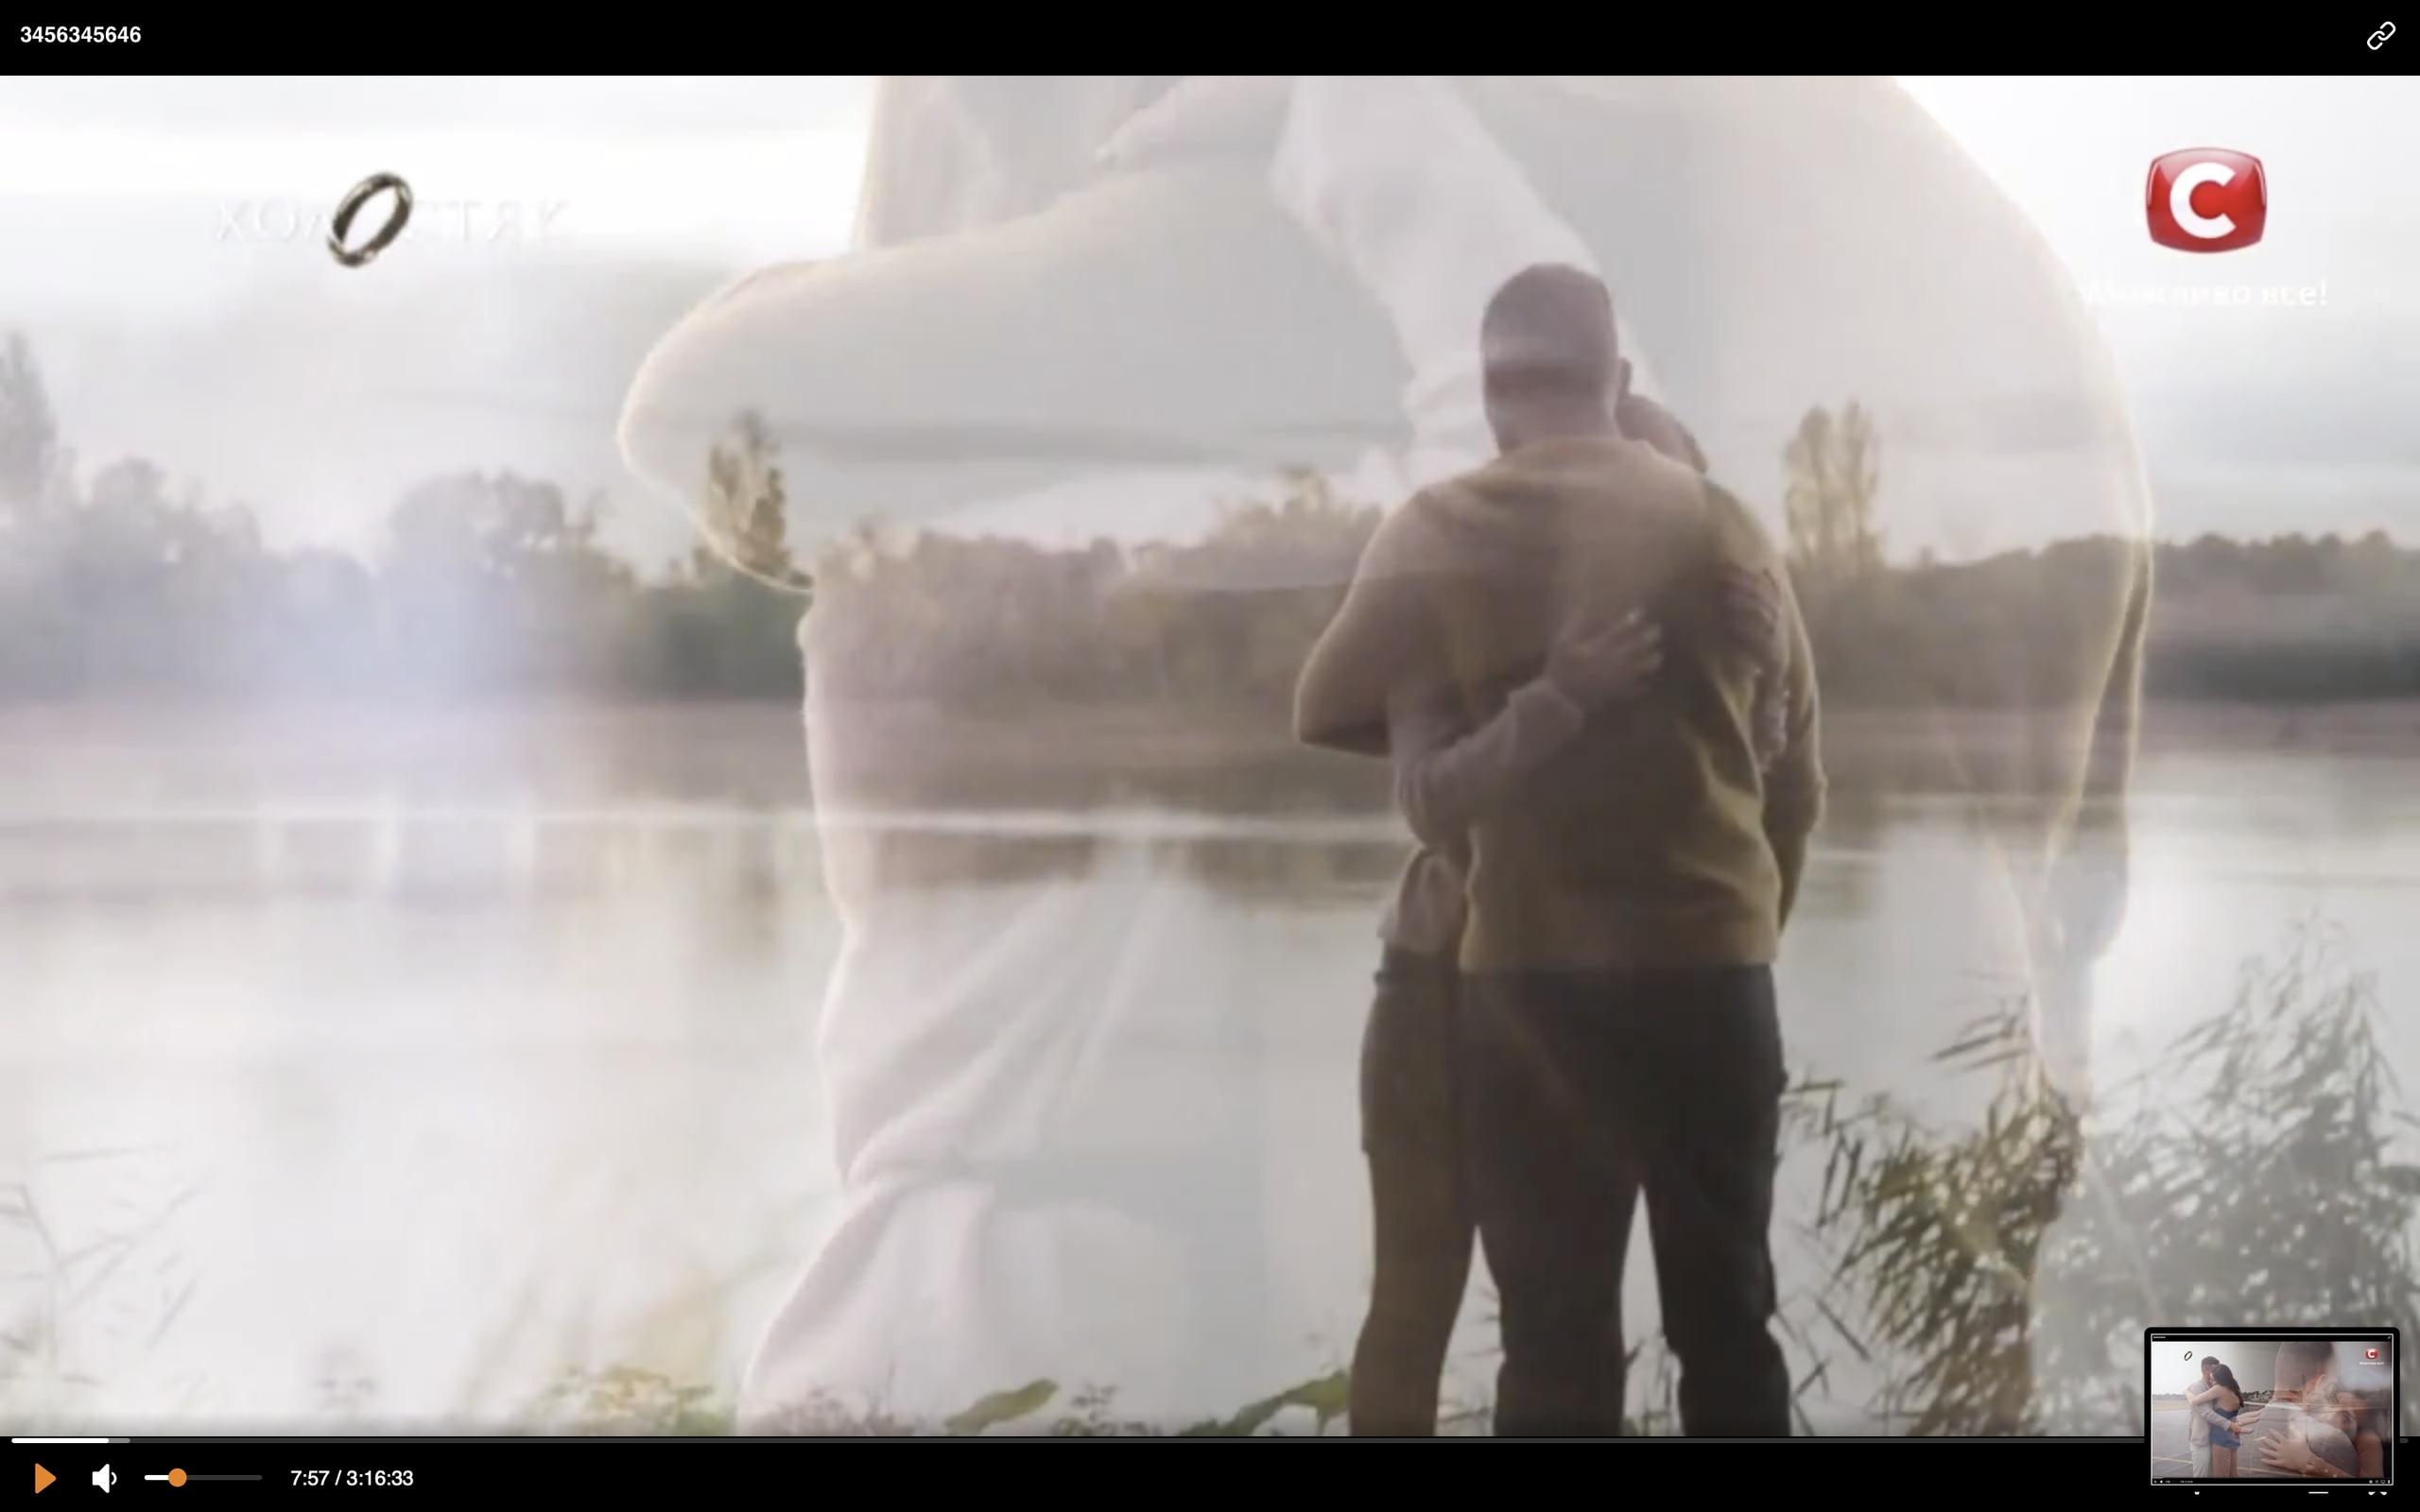 Bachelor Ukraine - Season 9 - Nikita Dobrynin - *Sleuthing Spoilers* - Page 10 UAMU2skPx9U